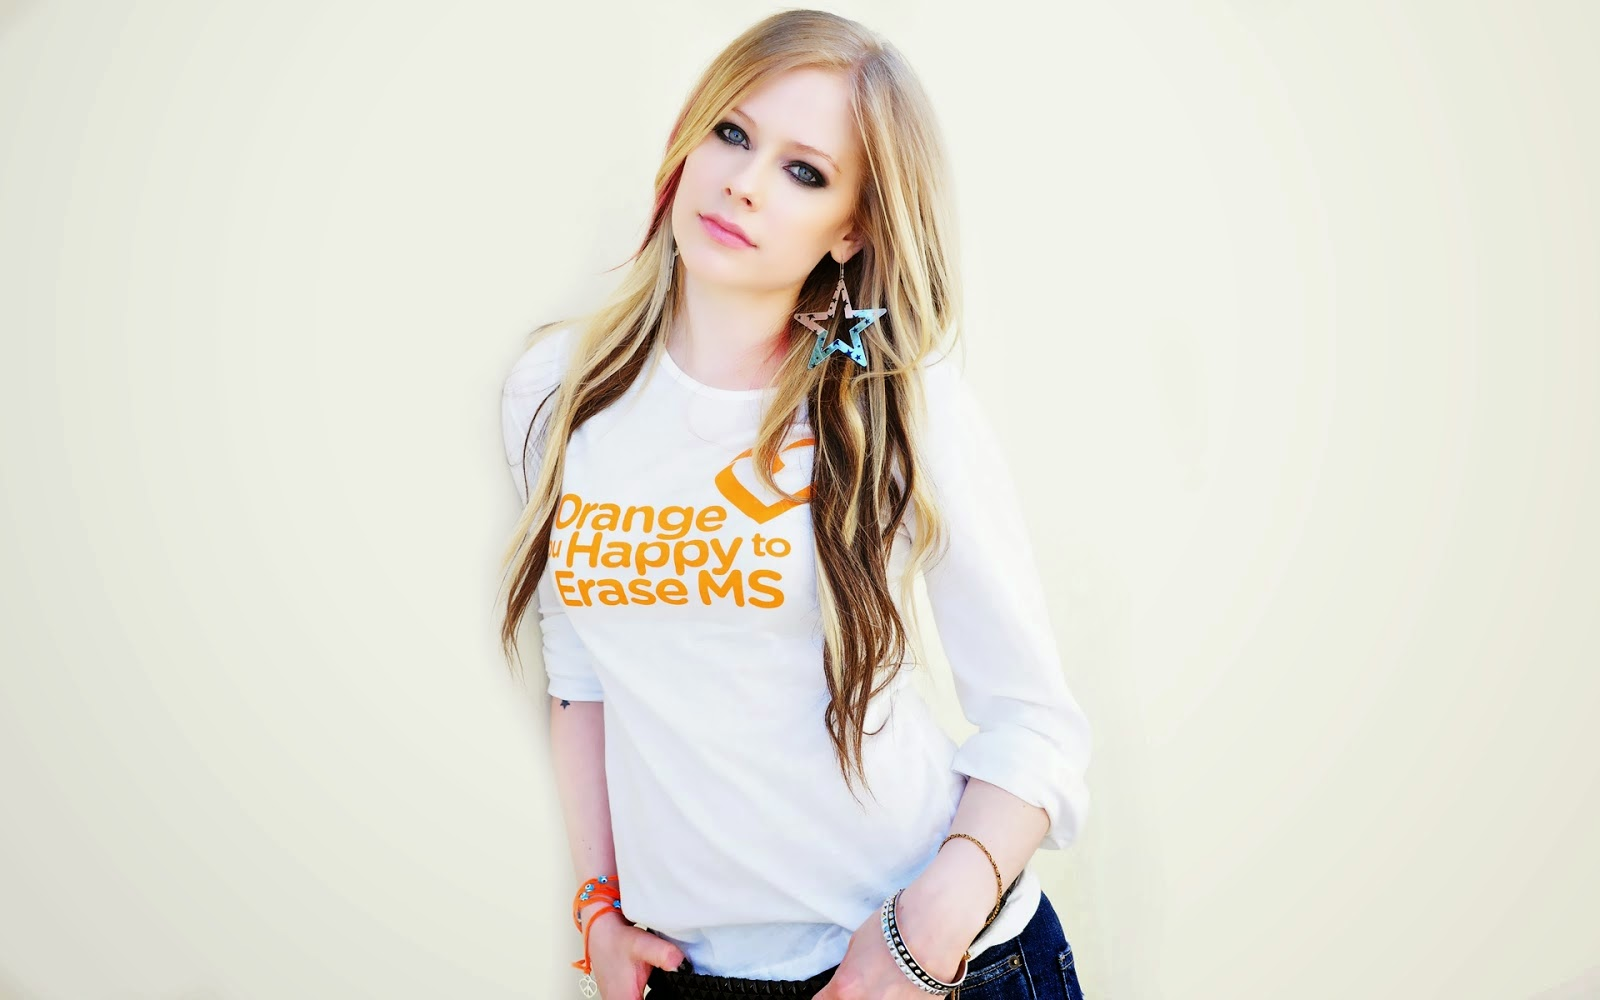 "<img src=""http://4.bp.blogspot.com/-9-MlLx503aU/U8k5dUBKNLI/AAAAAAAAL5I/qWAKrxmETRM/s1600/avril-lavigne-hd-wallpaper.jpg"" alt=""Avril Lavigne HD Wallpaper"" />"